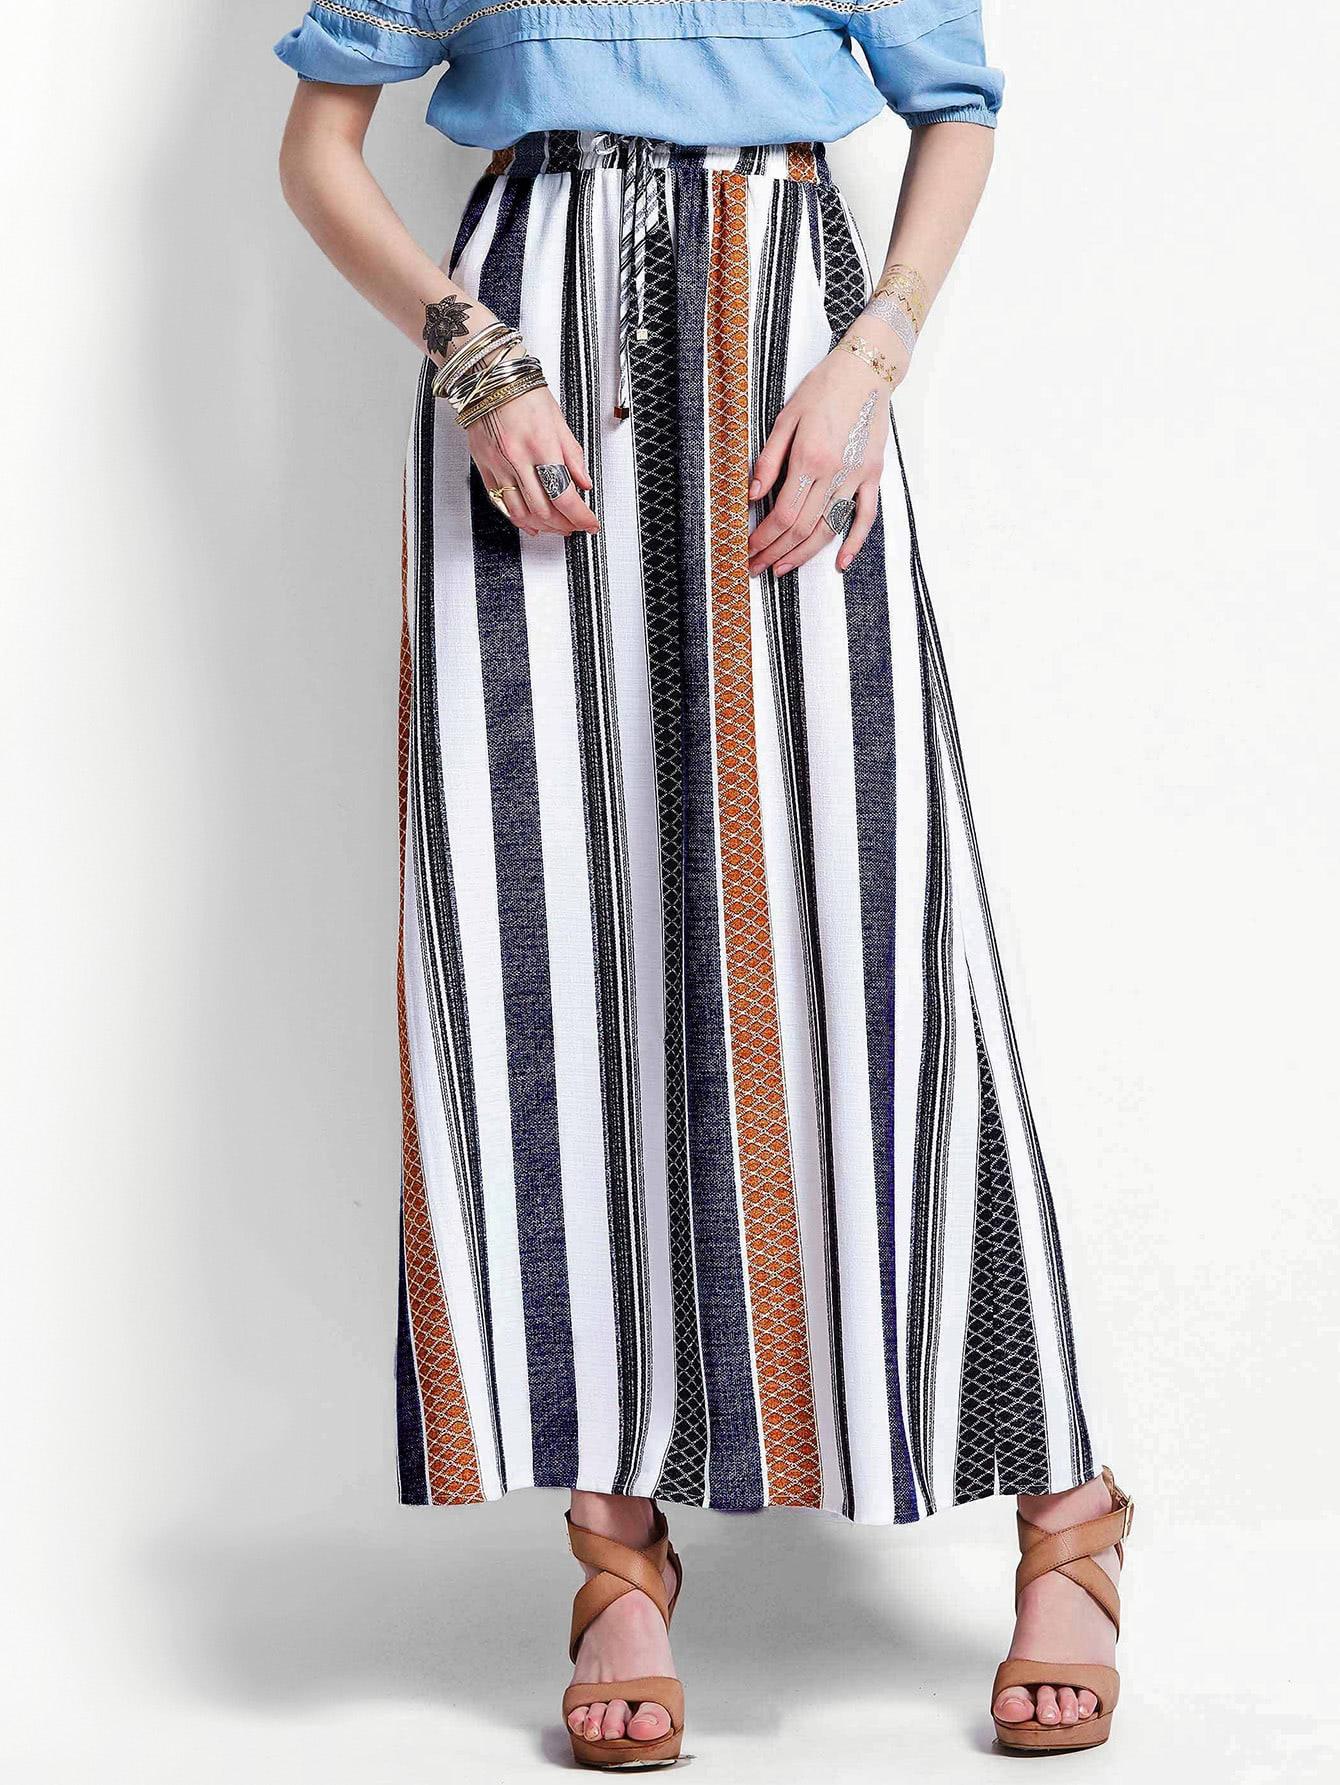 Drawstring Waist Striped Full Length Skirt серьги polina selezneva серьги ps by polina selezneva